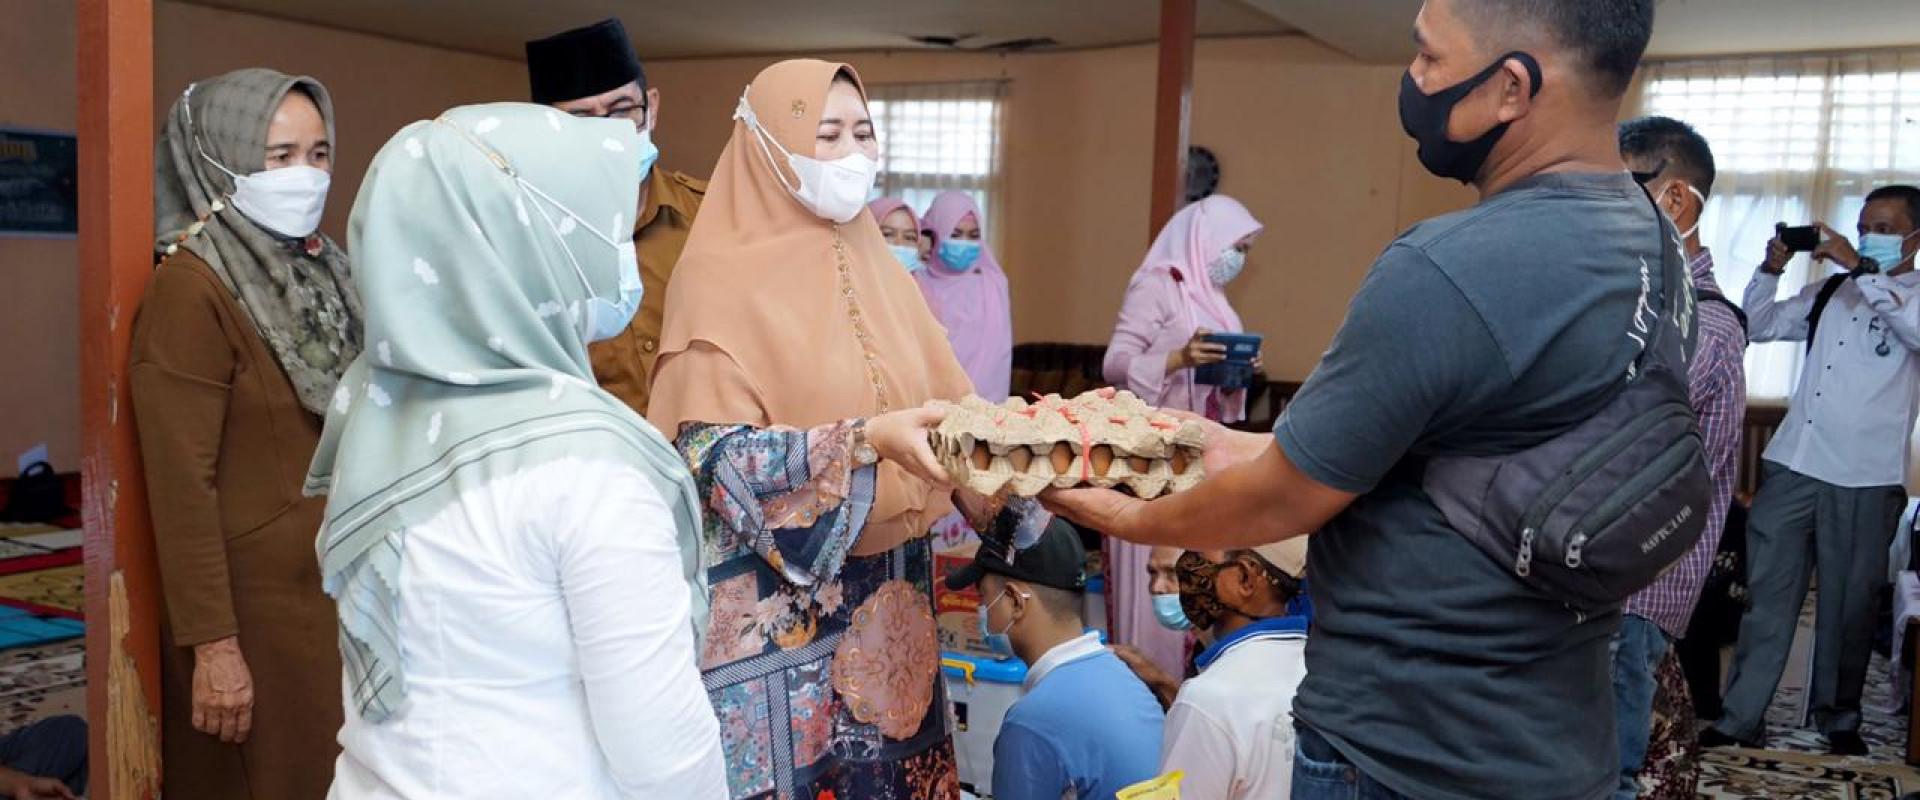 Kunjungi Rumah Singgah Baiturrahman Dinas Sosial, Hj.Zulaikha Wardan bagikan santunan 20 paket sembako